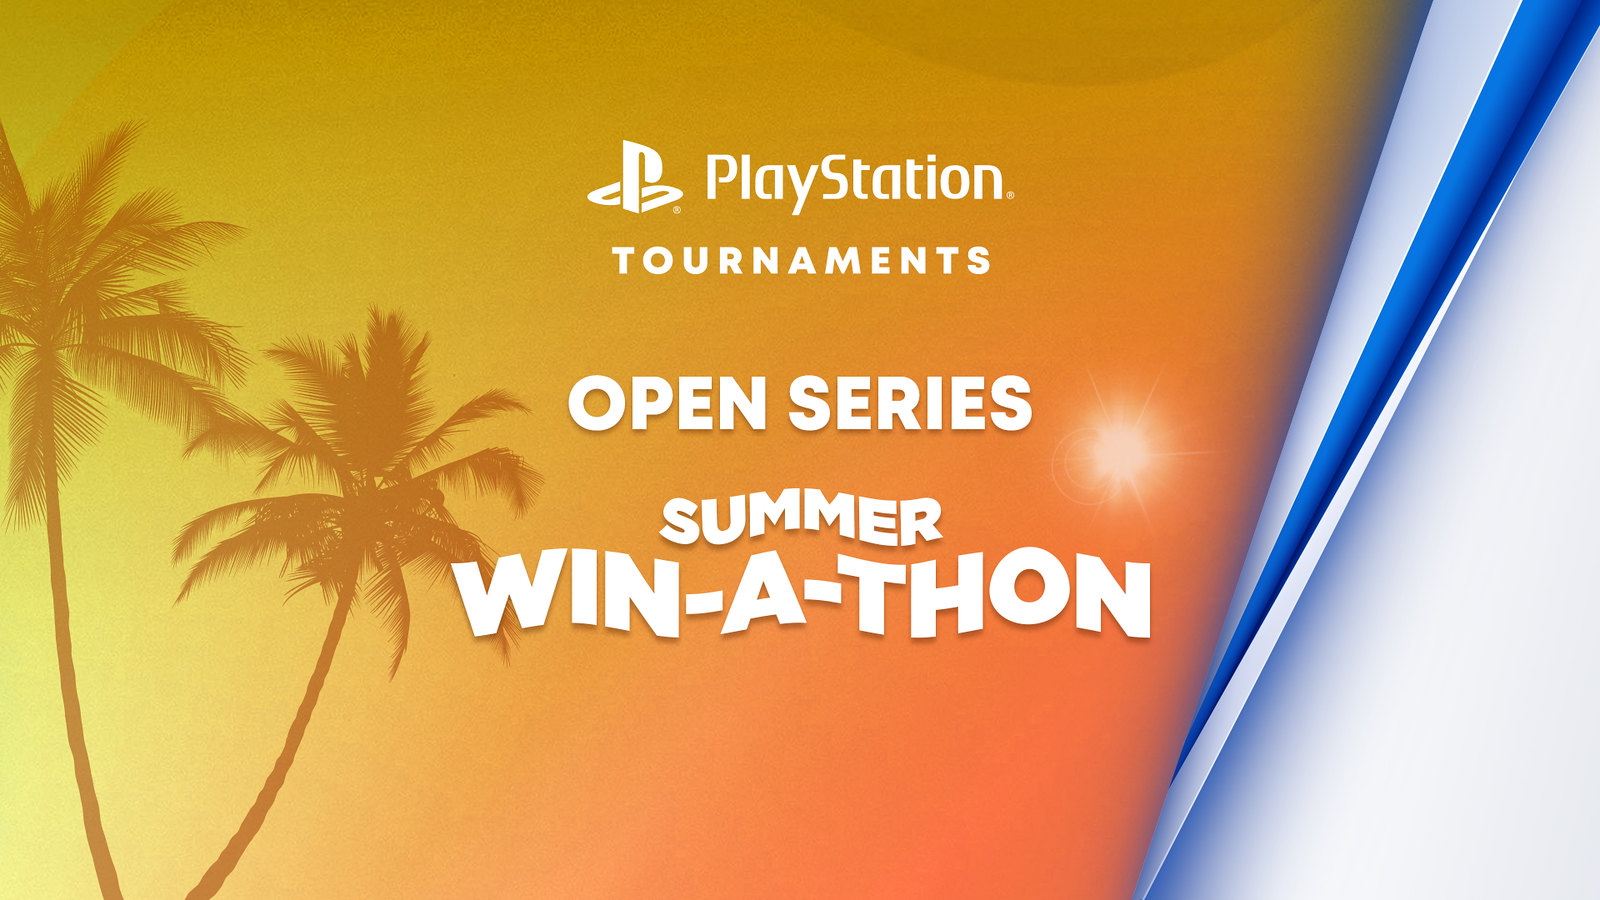 PS4 Open Series